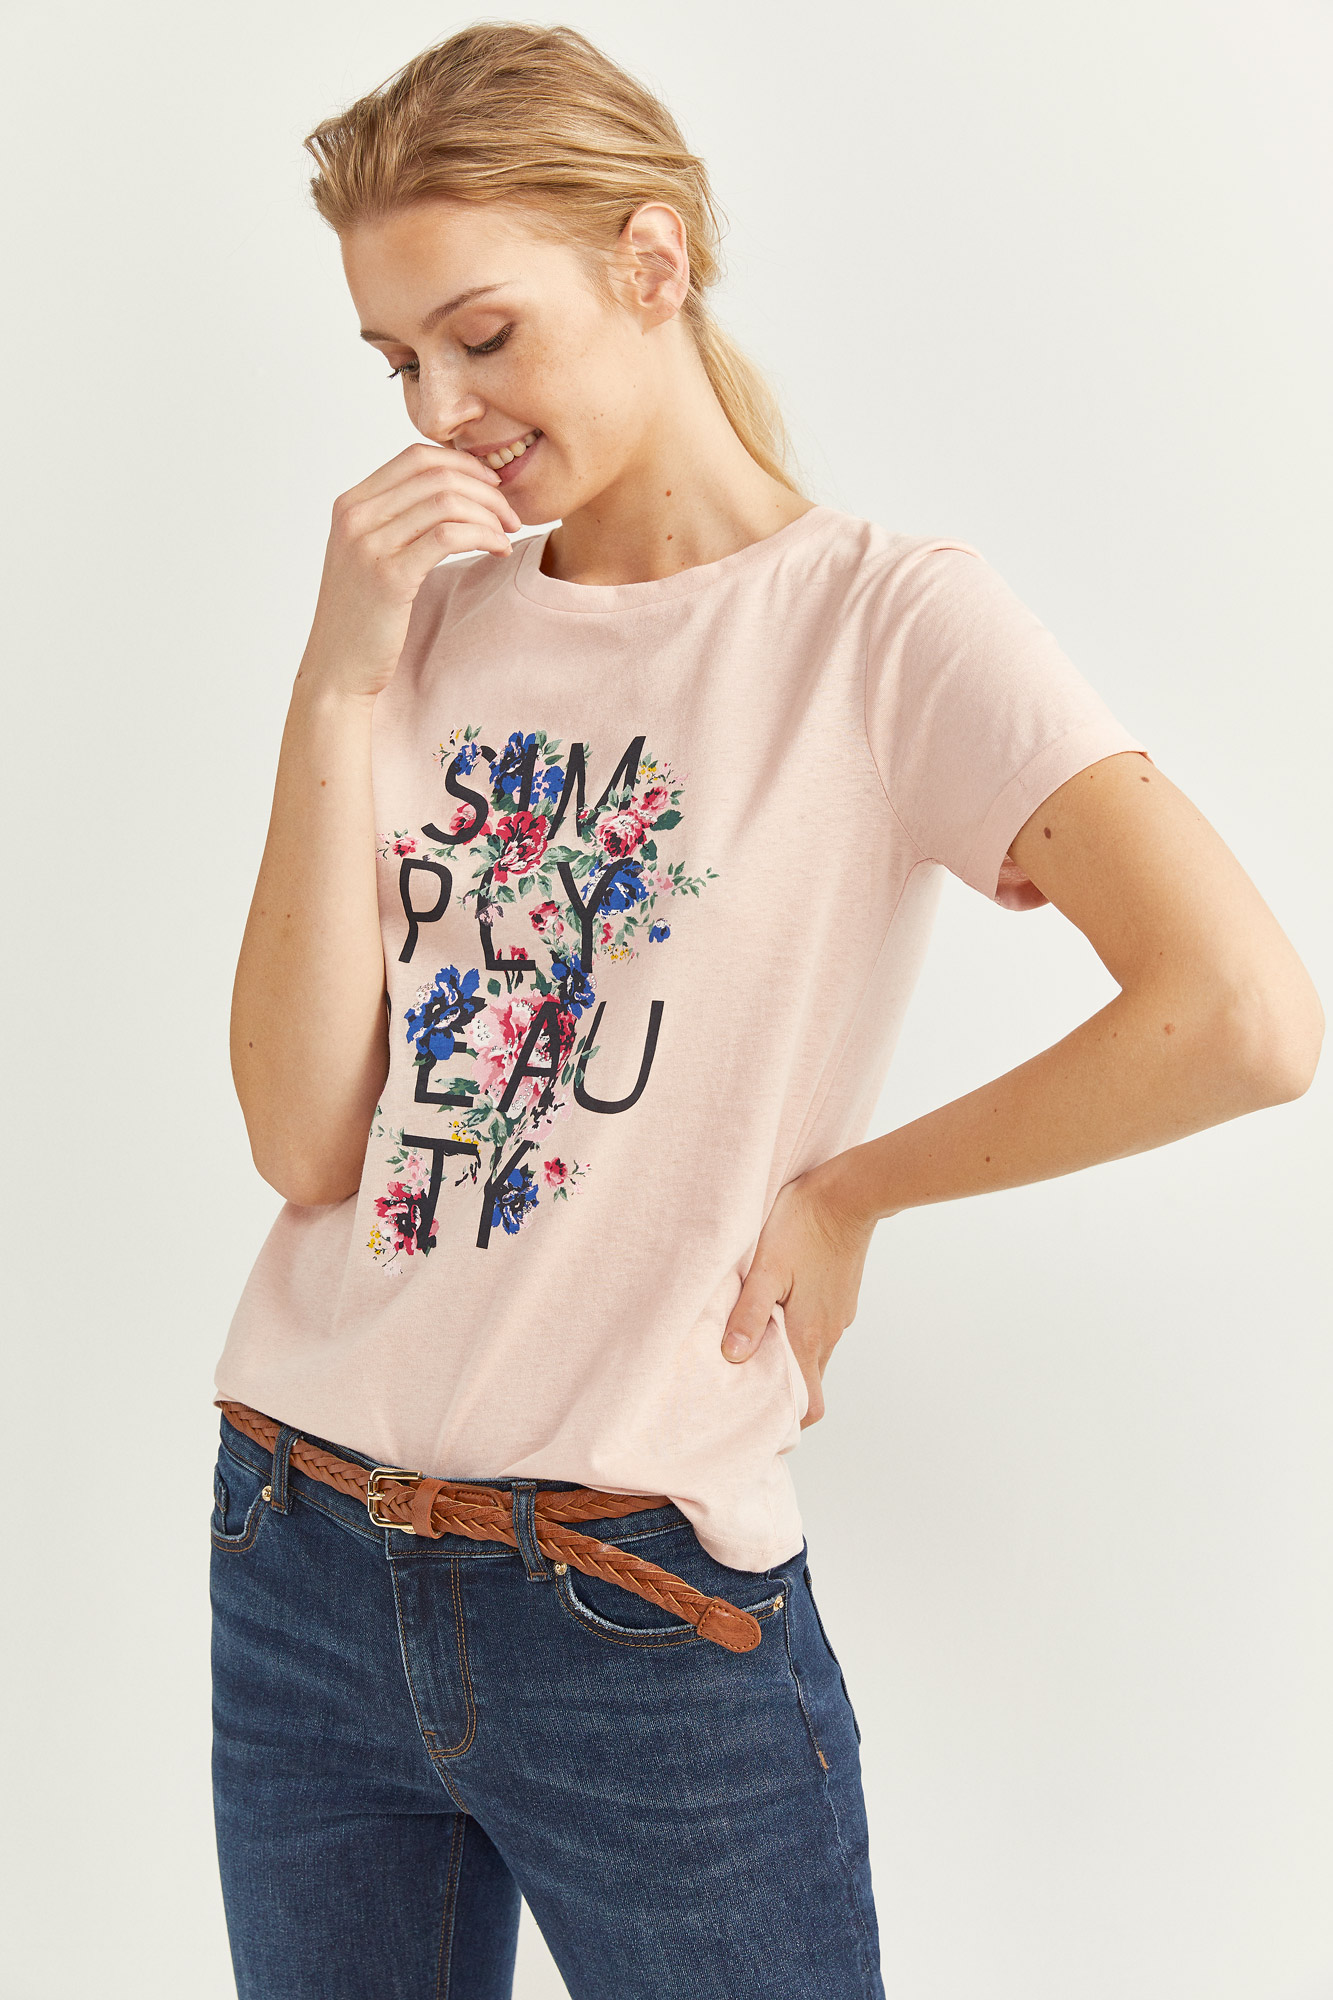 Camiseta Gráfica Texto y Flor